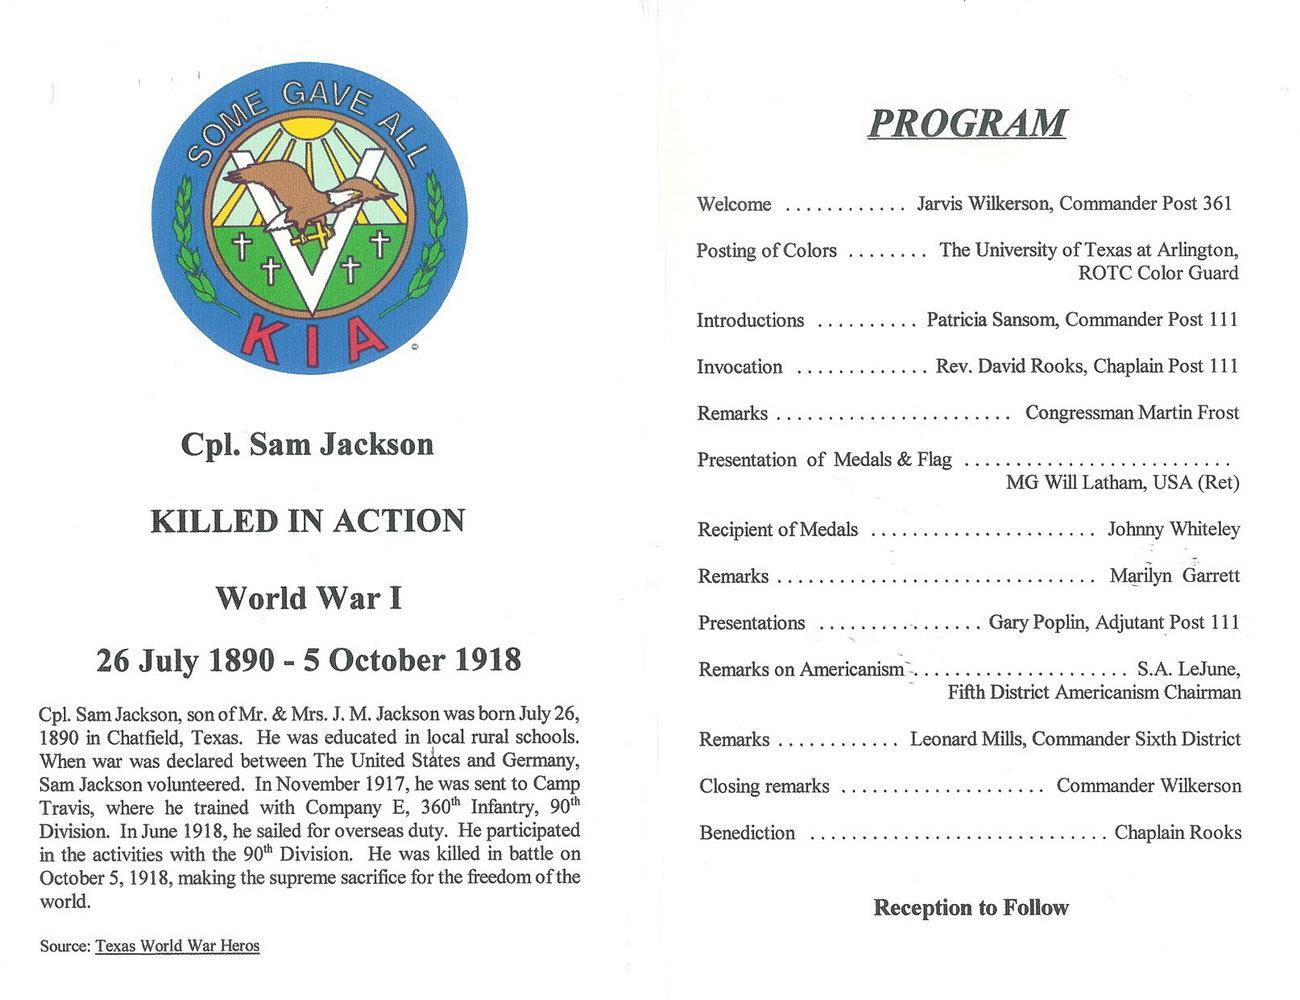 Dedication Ceremony Program Template